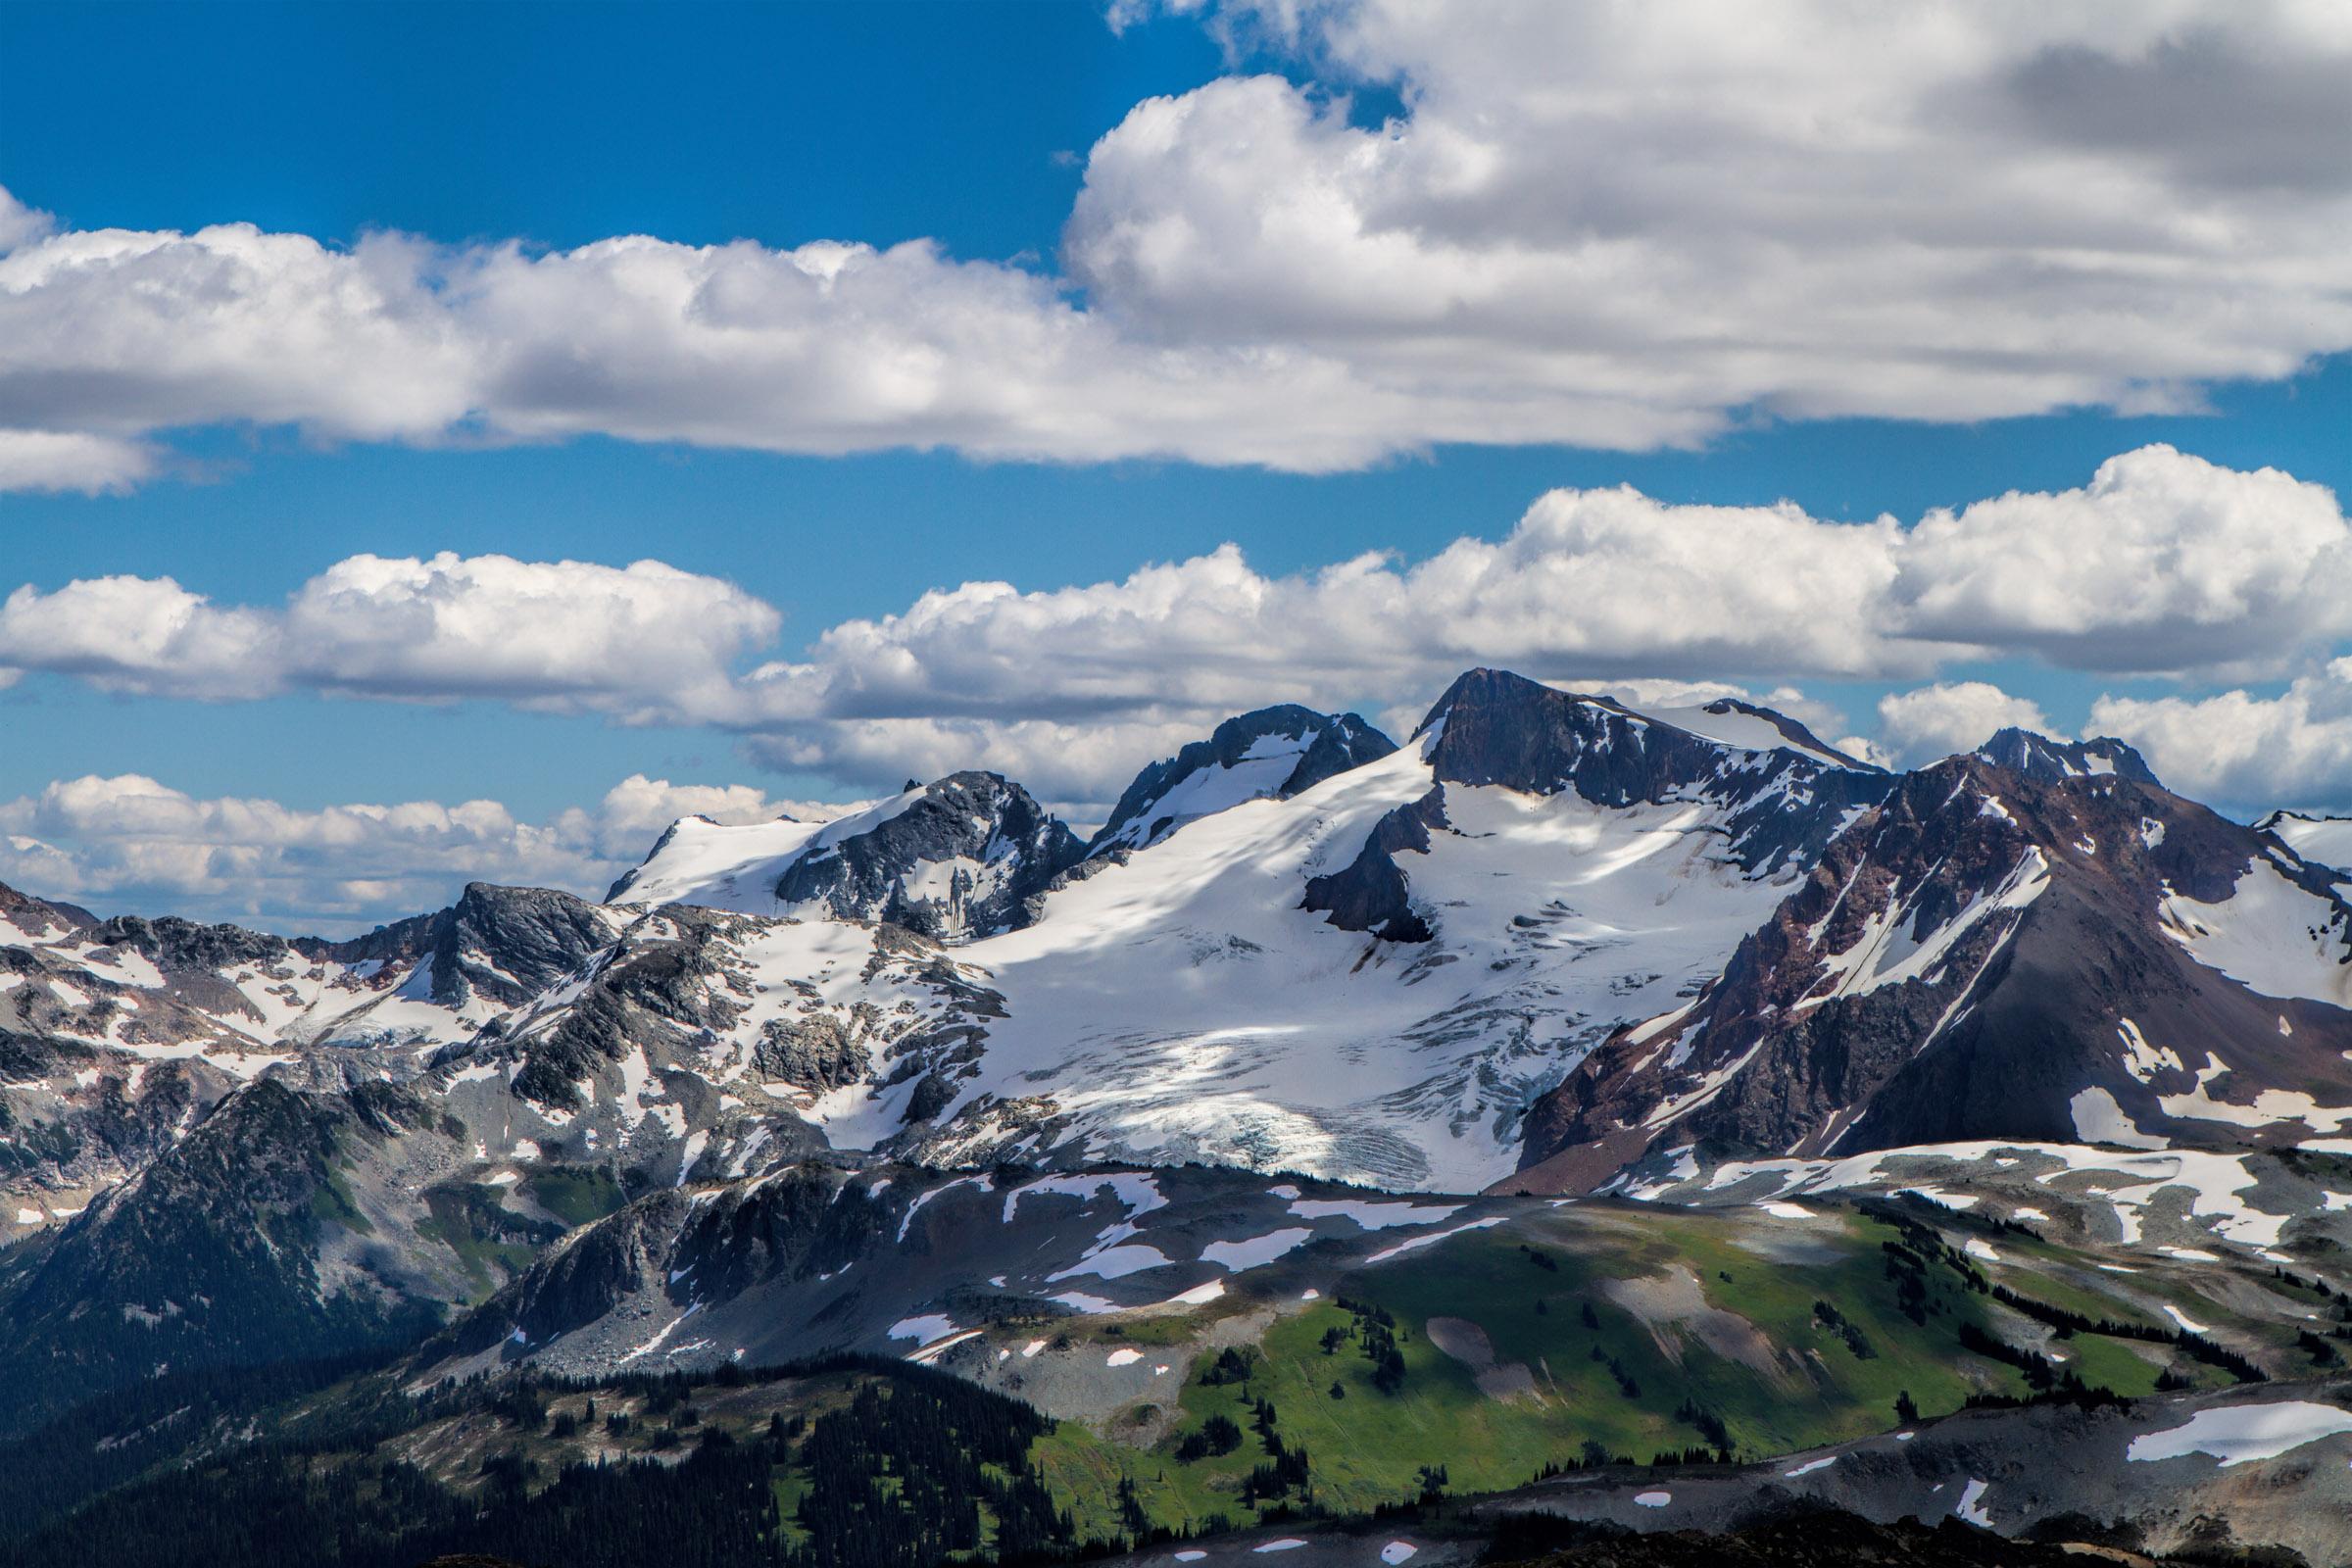 Alpine Mountain Top, Adorable, Sky, Peak, Picturesque, HQ Photo